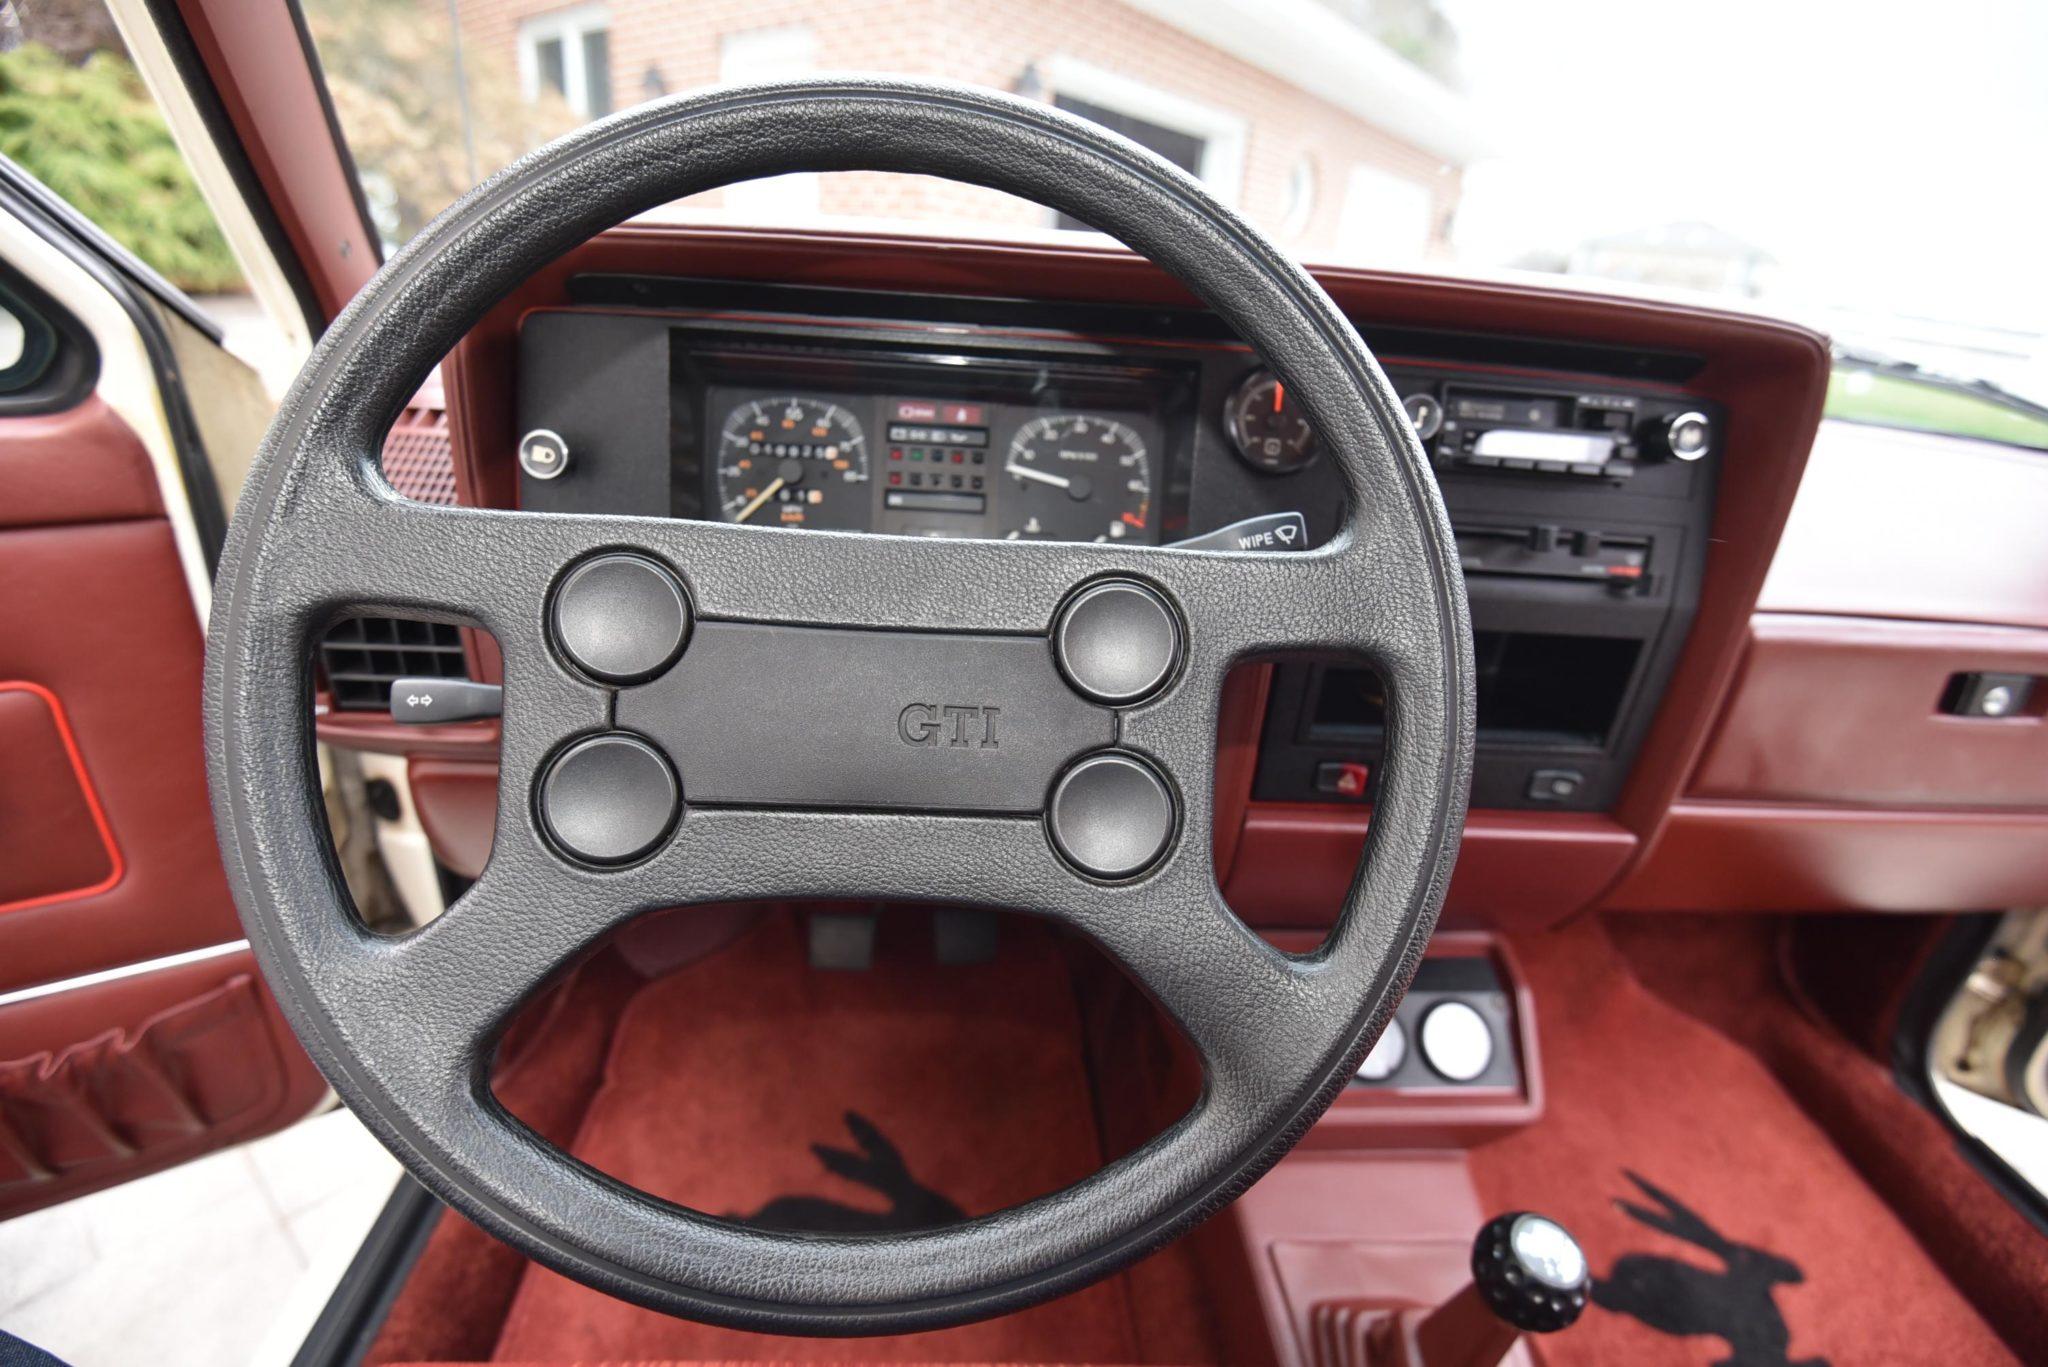 1983_volkswagen_rabbit_gti_15870410469c27f8dLEM_0042-scaled